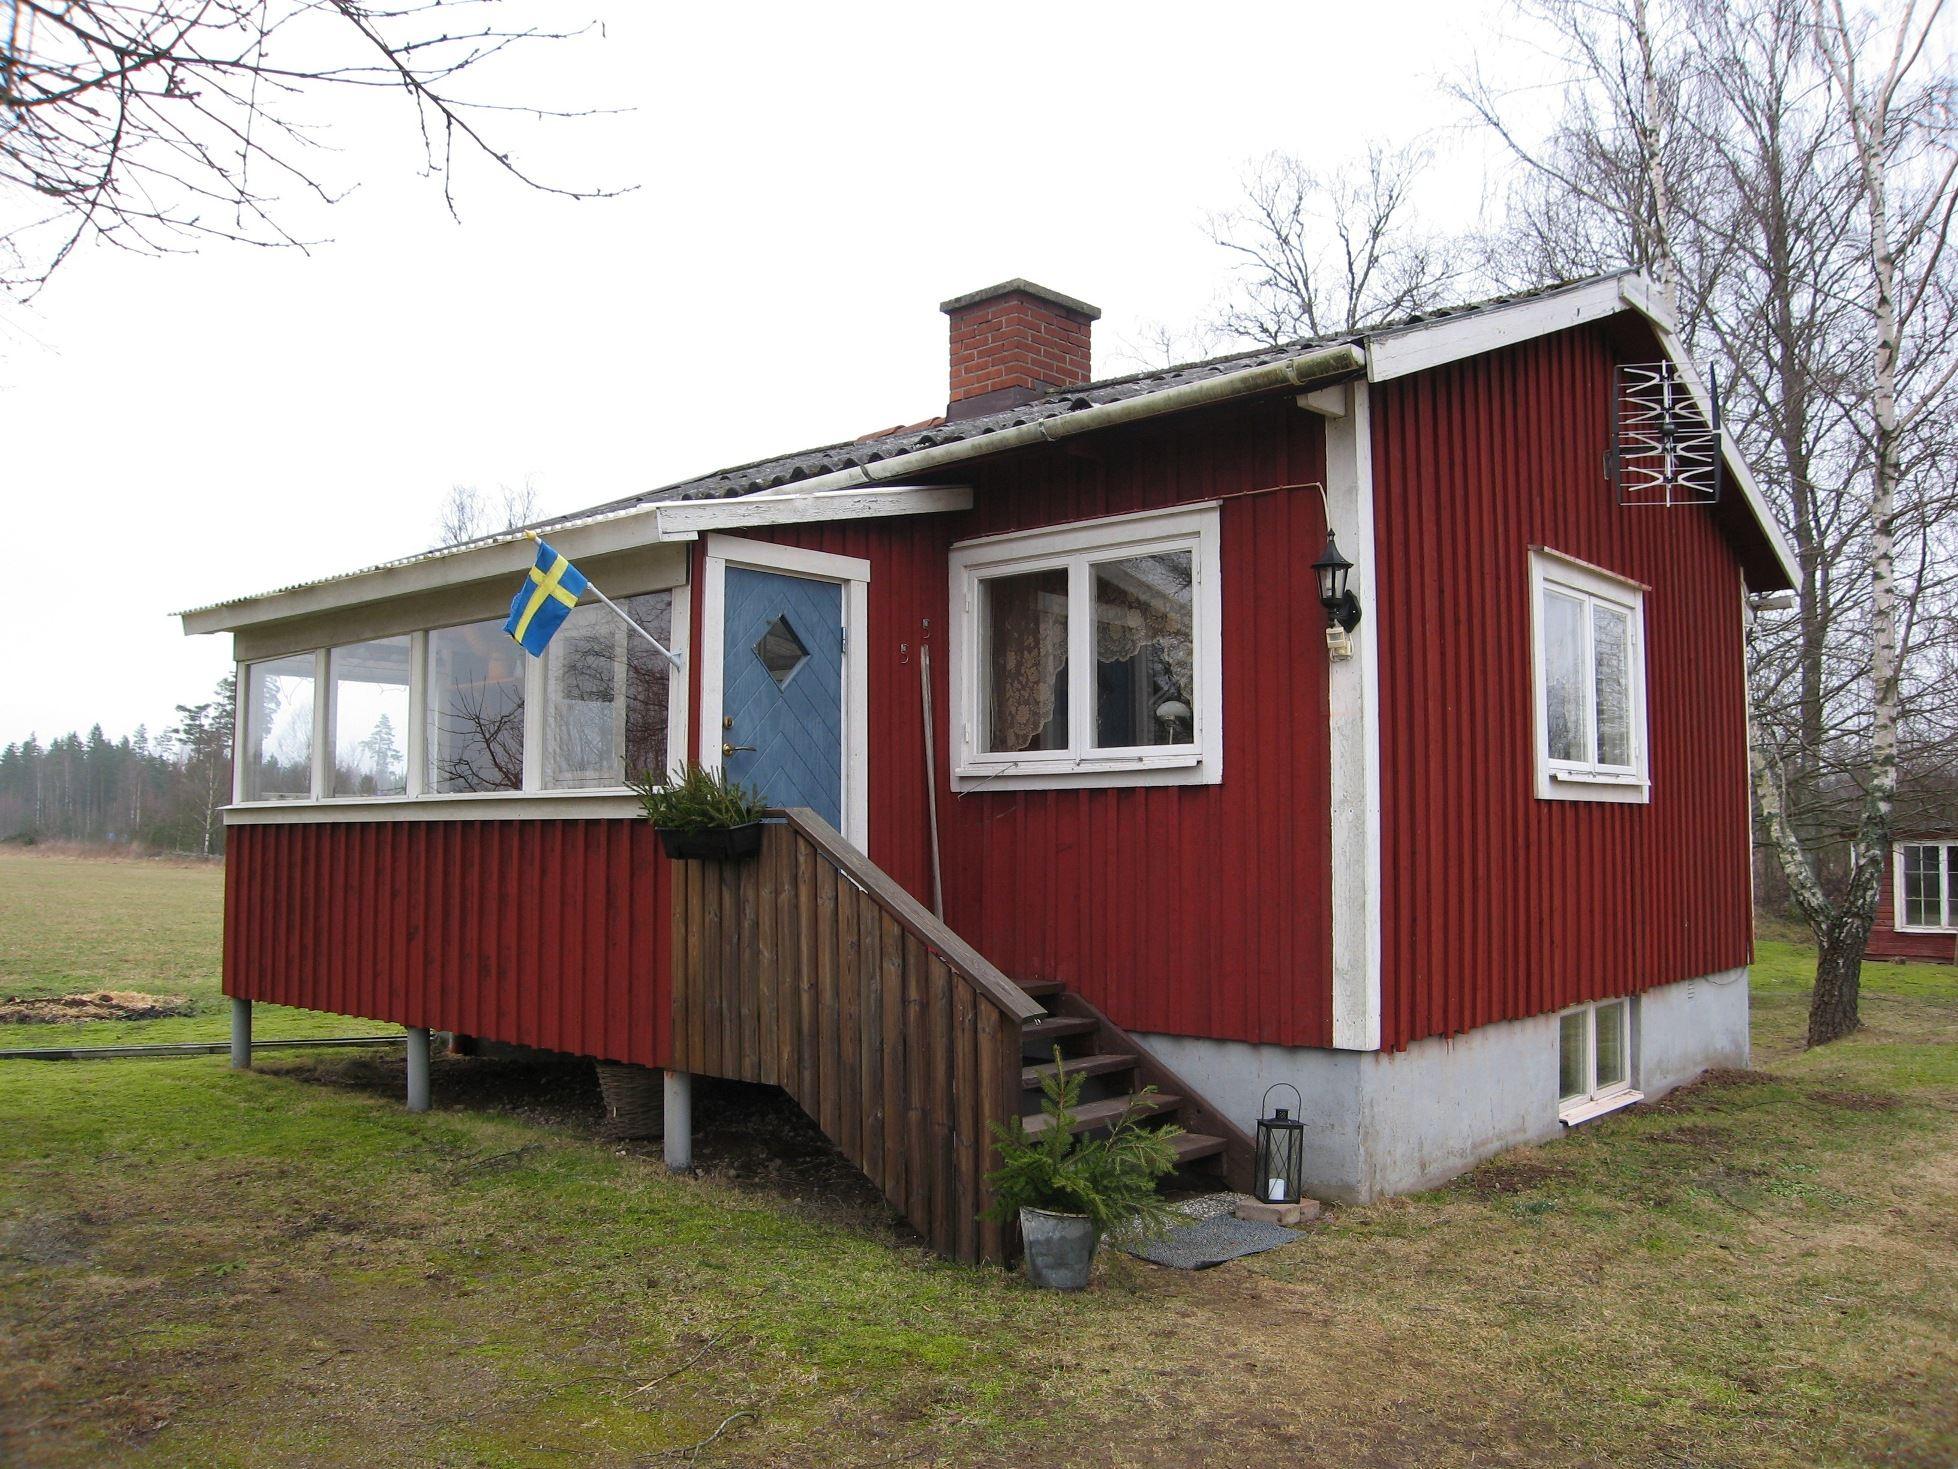 GS80013 Stojby, Växjö